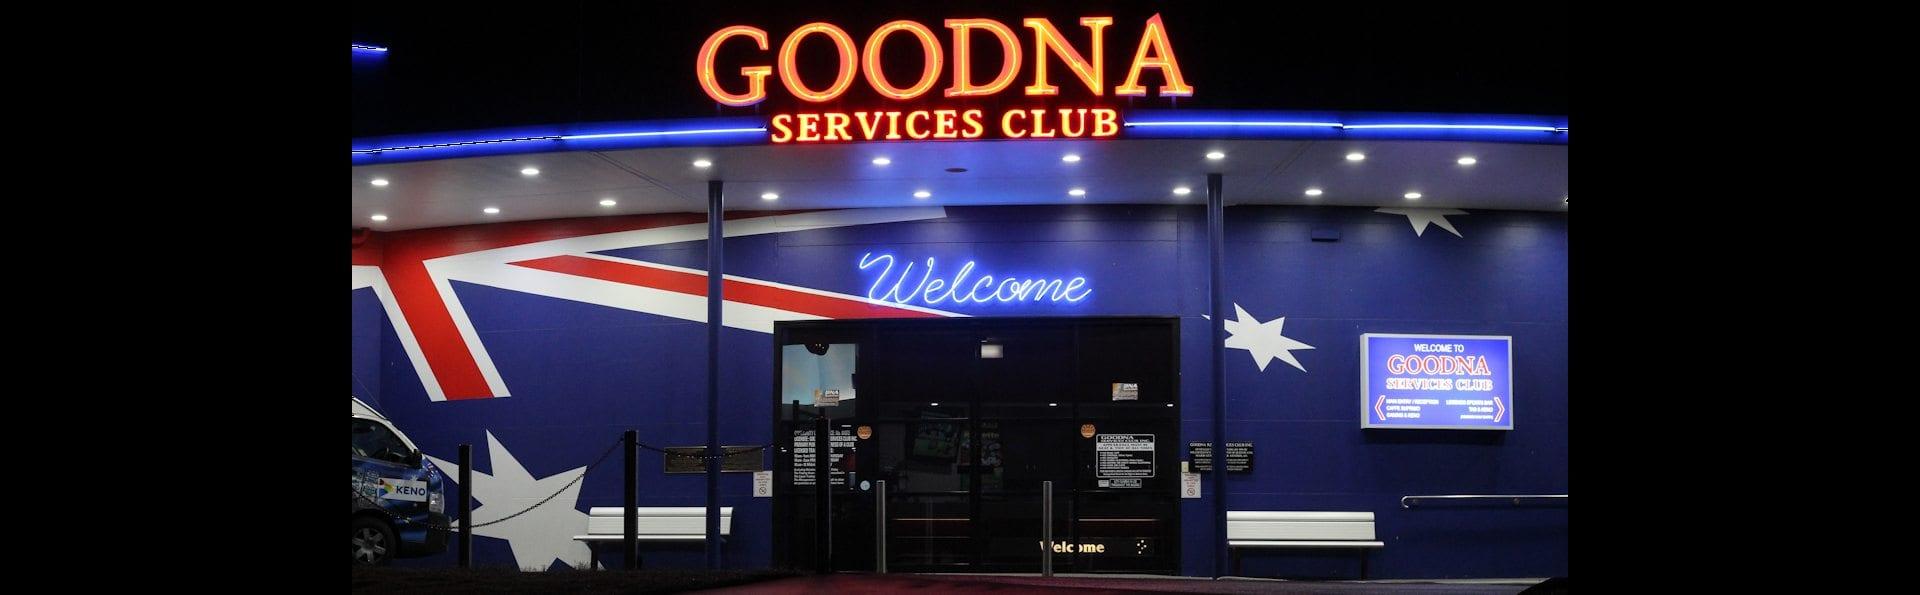 GoodnaServicesSlider2